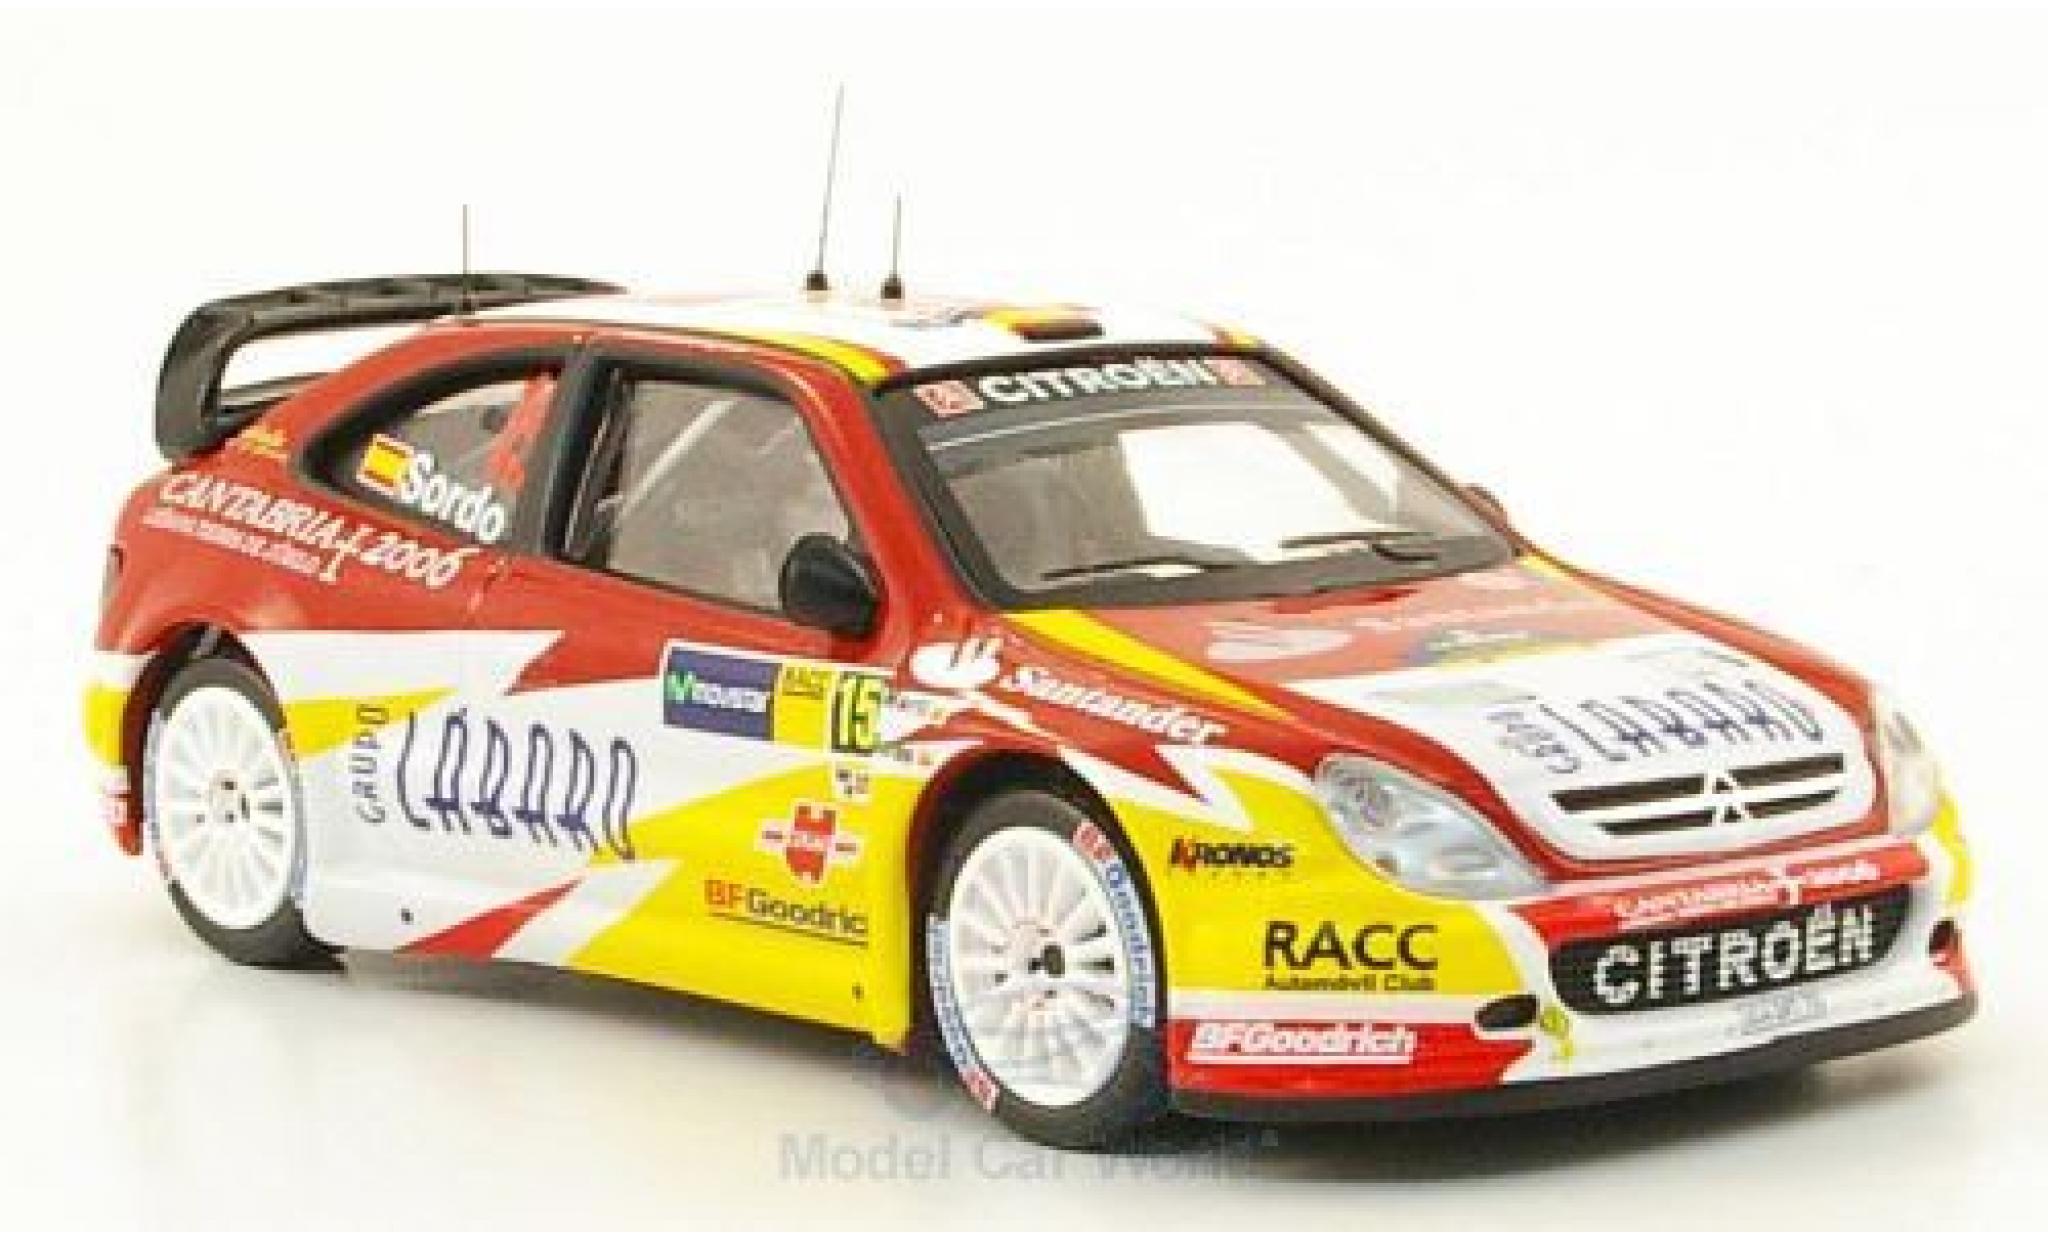 Citroen Xsara 1/43 IXO WRC No.15 Rallye Catalunya 2006 D.Sordo/M.Marti